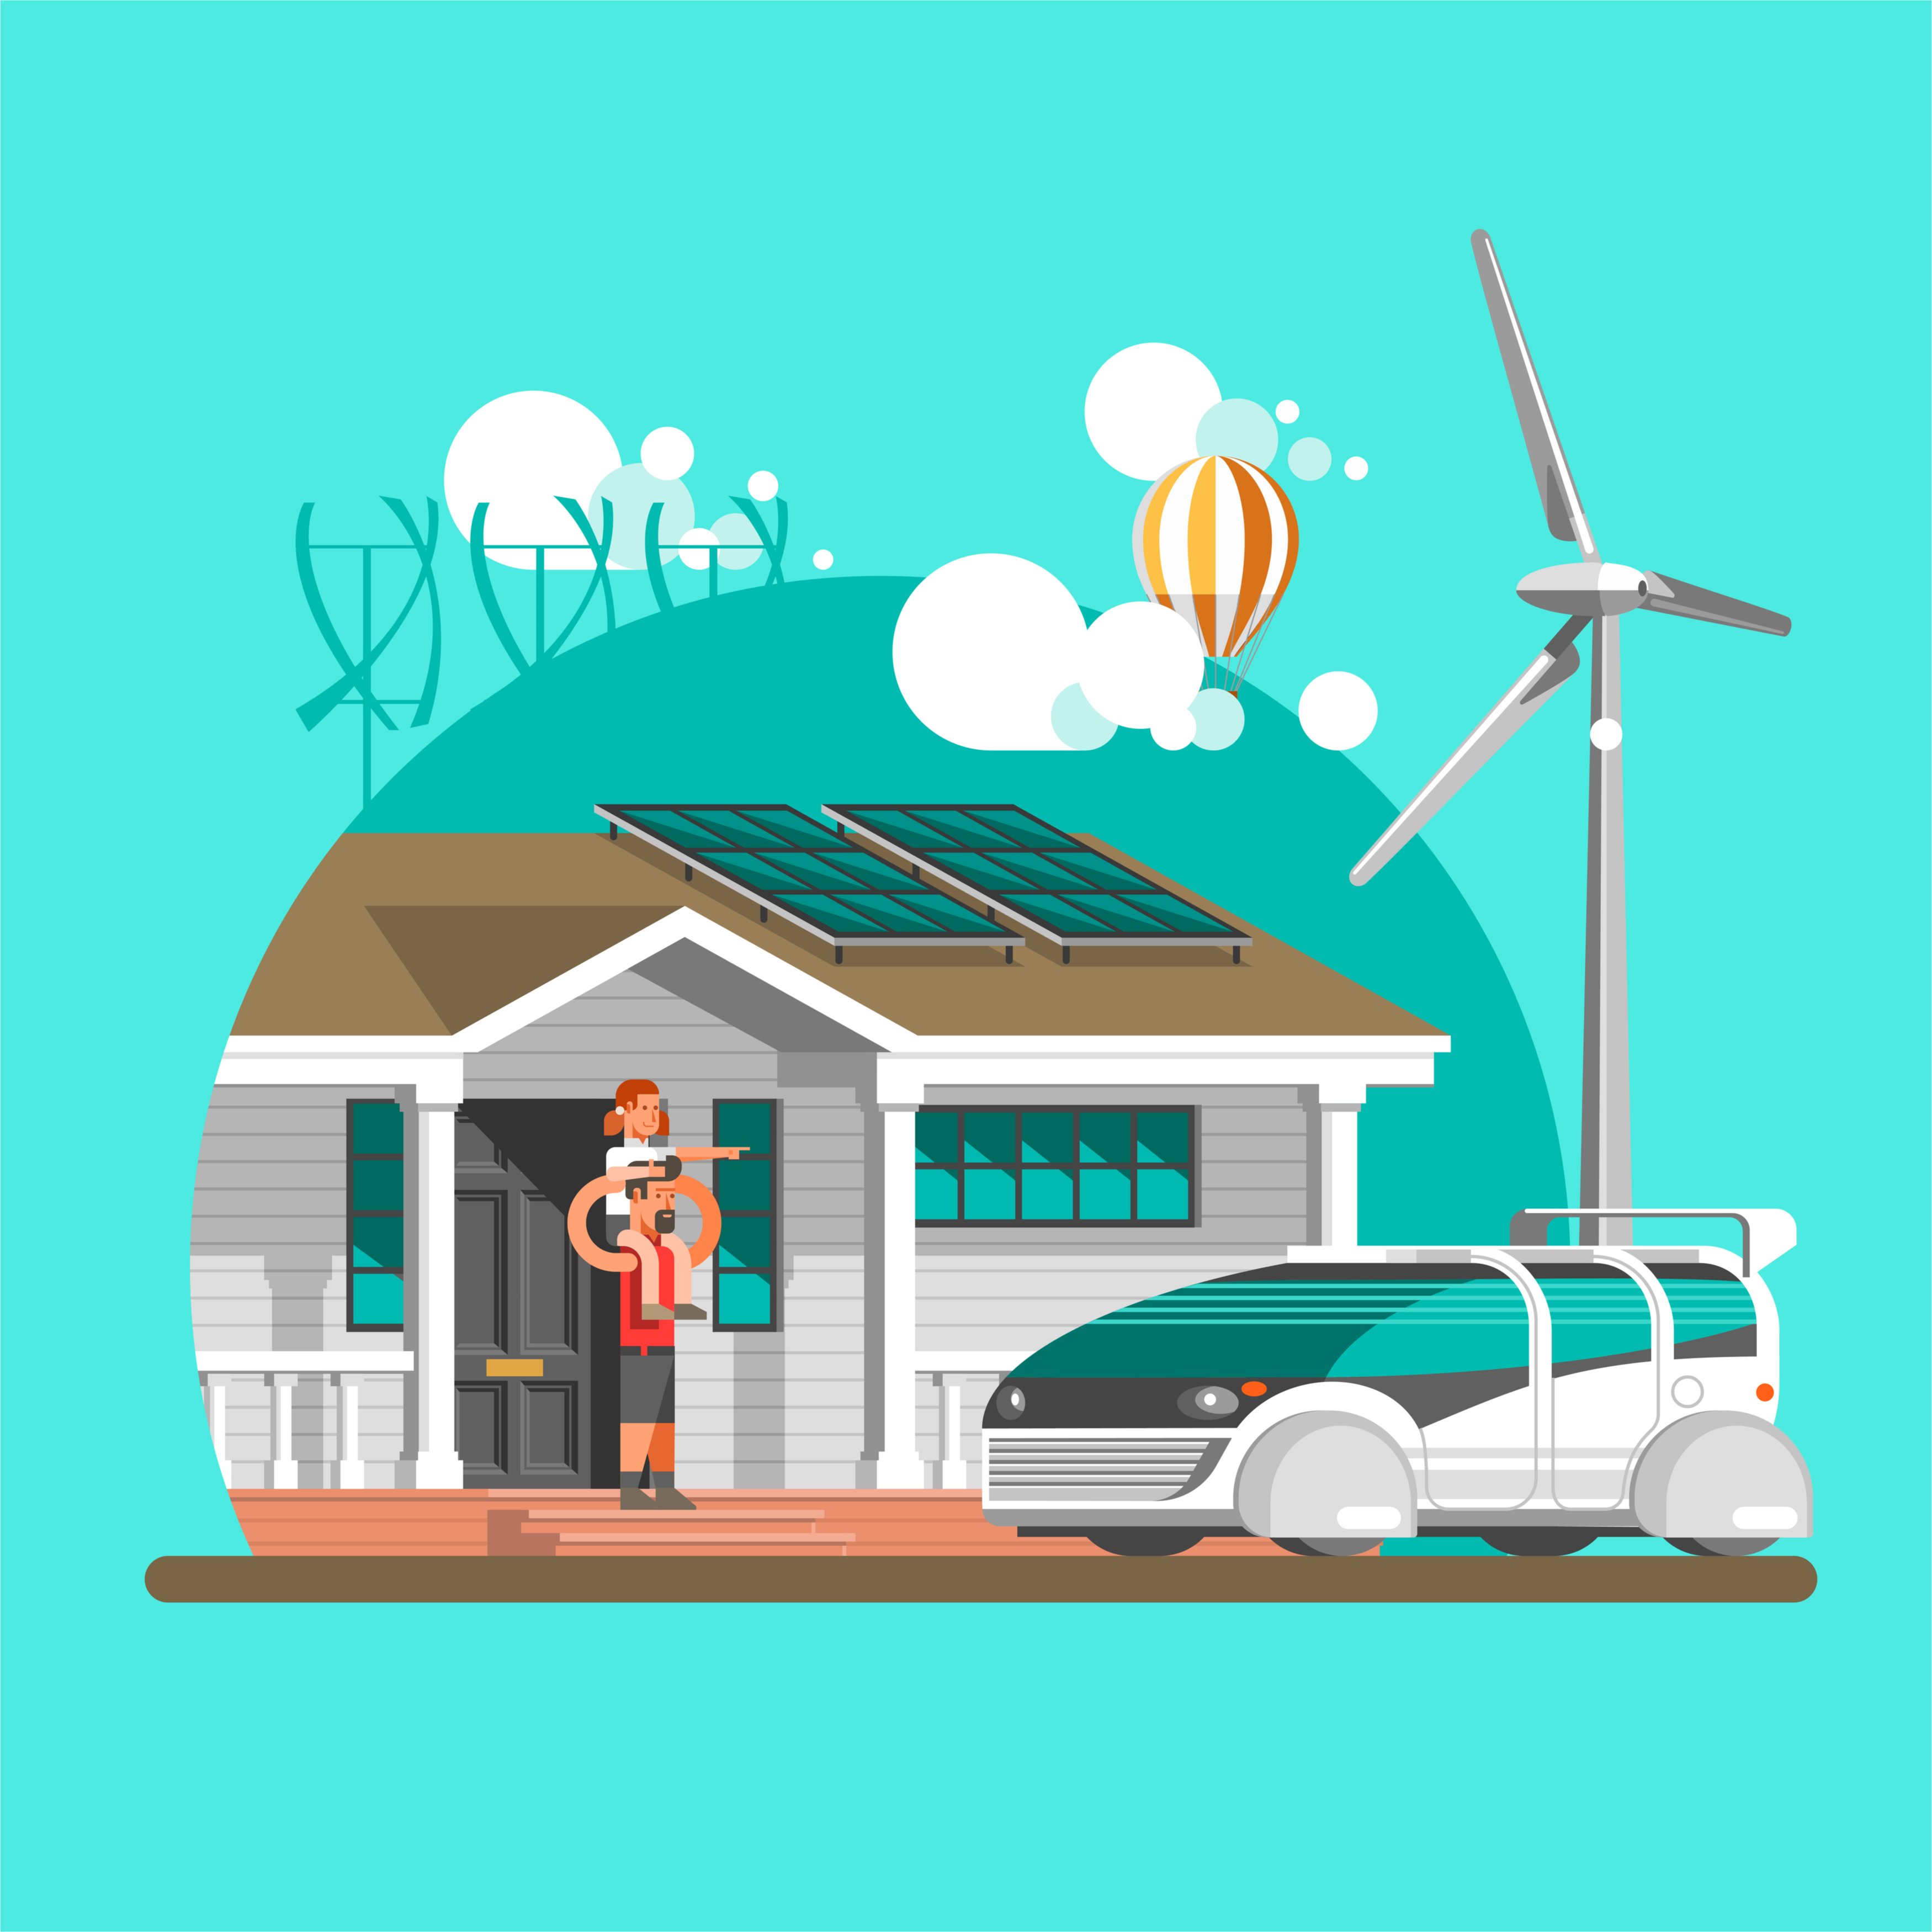 Digitaliseringen av energibranschen